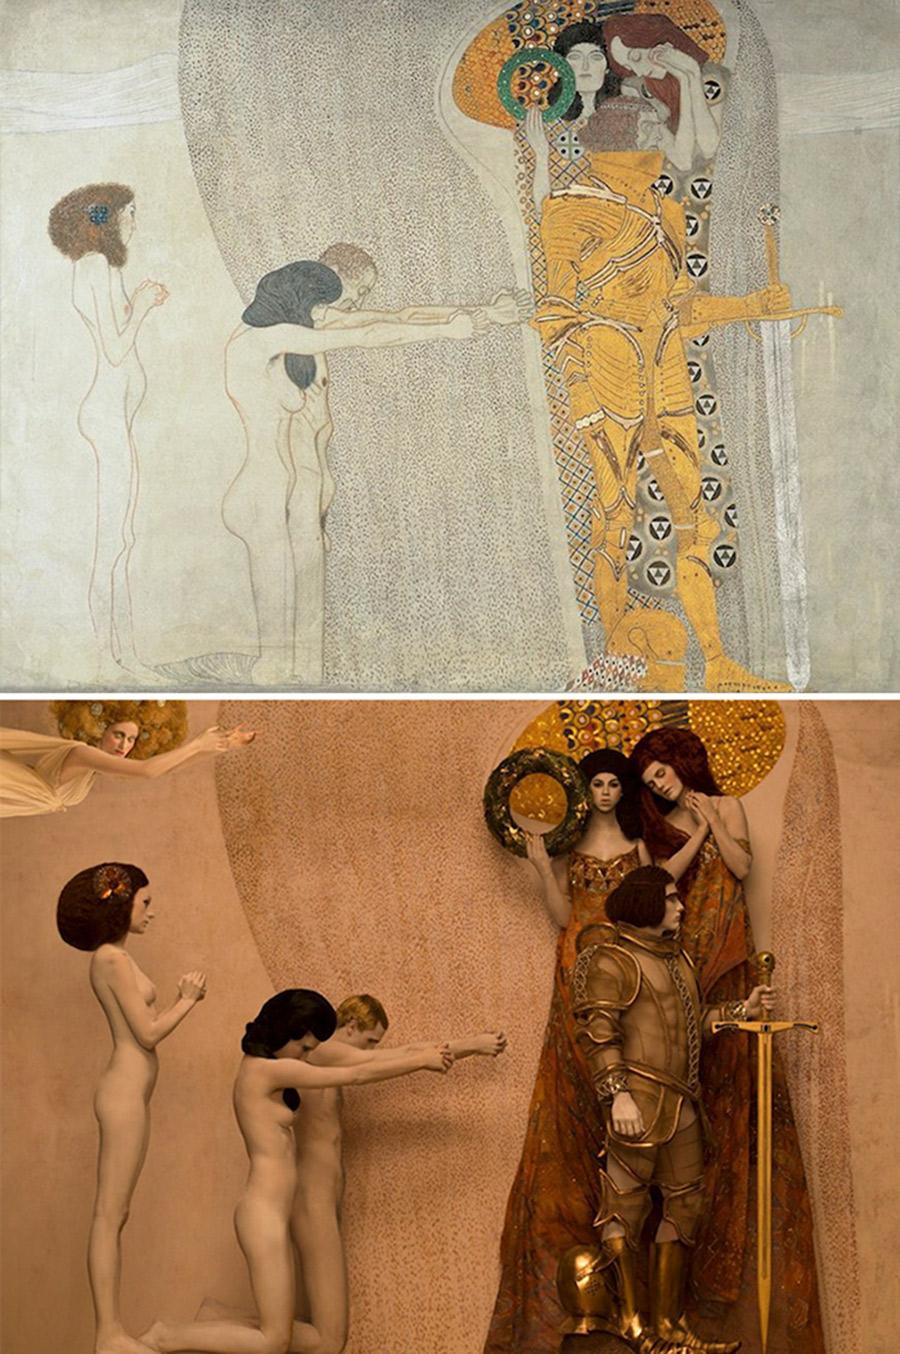 Gustav Klimt - Beethoven Frieze